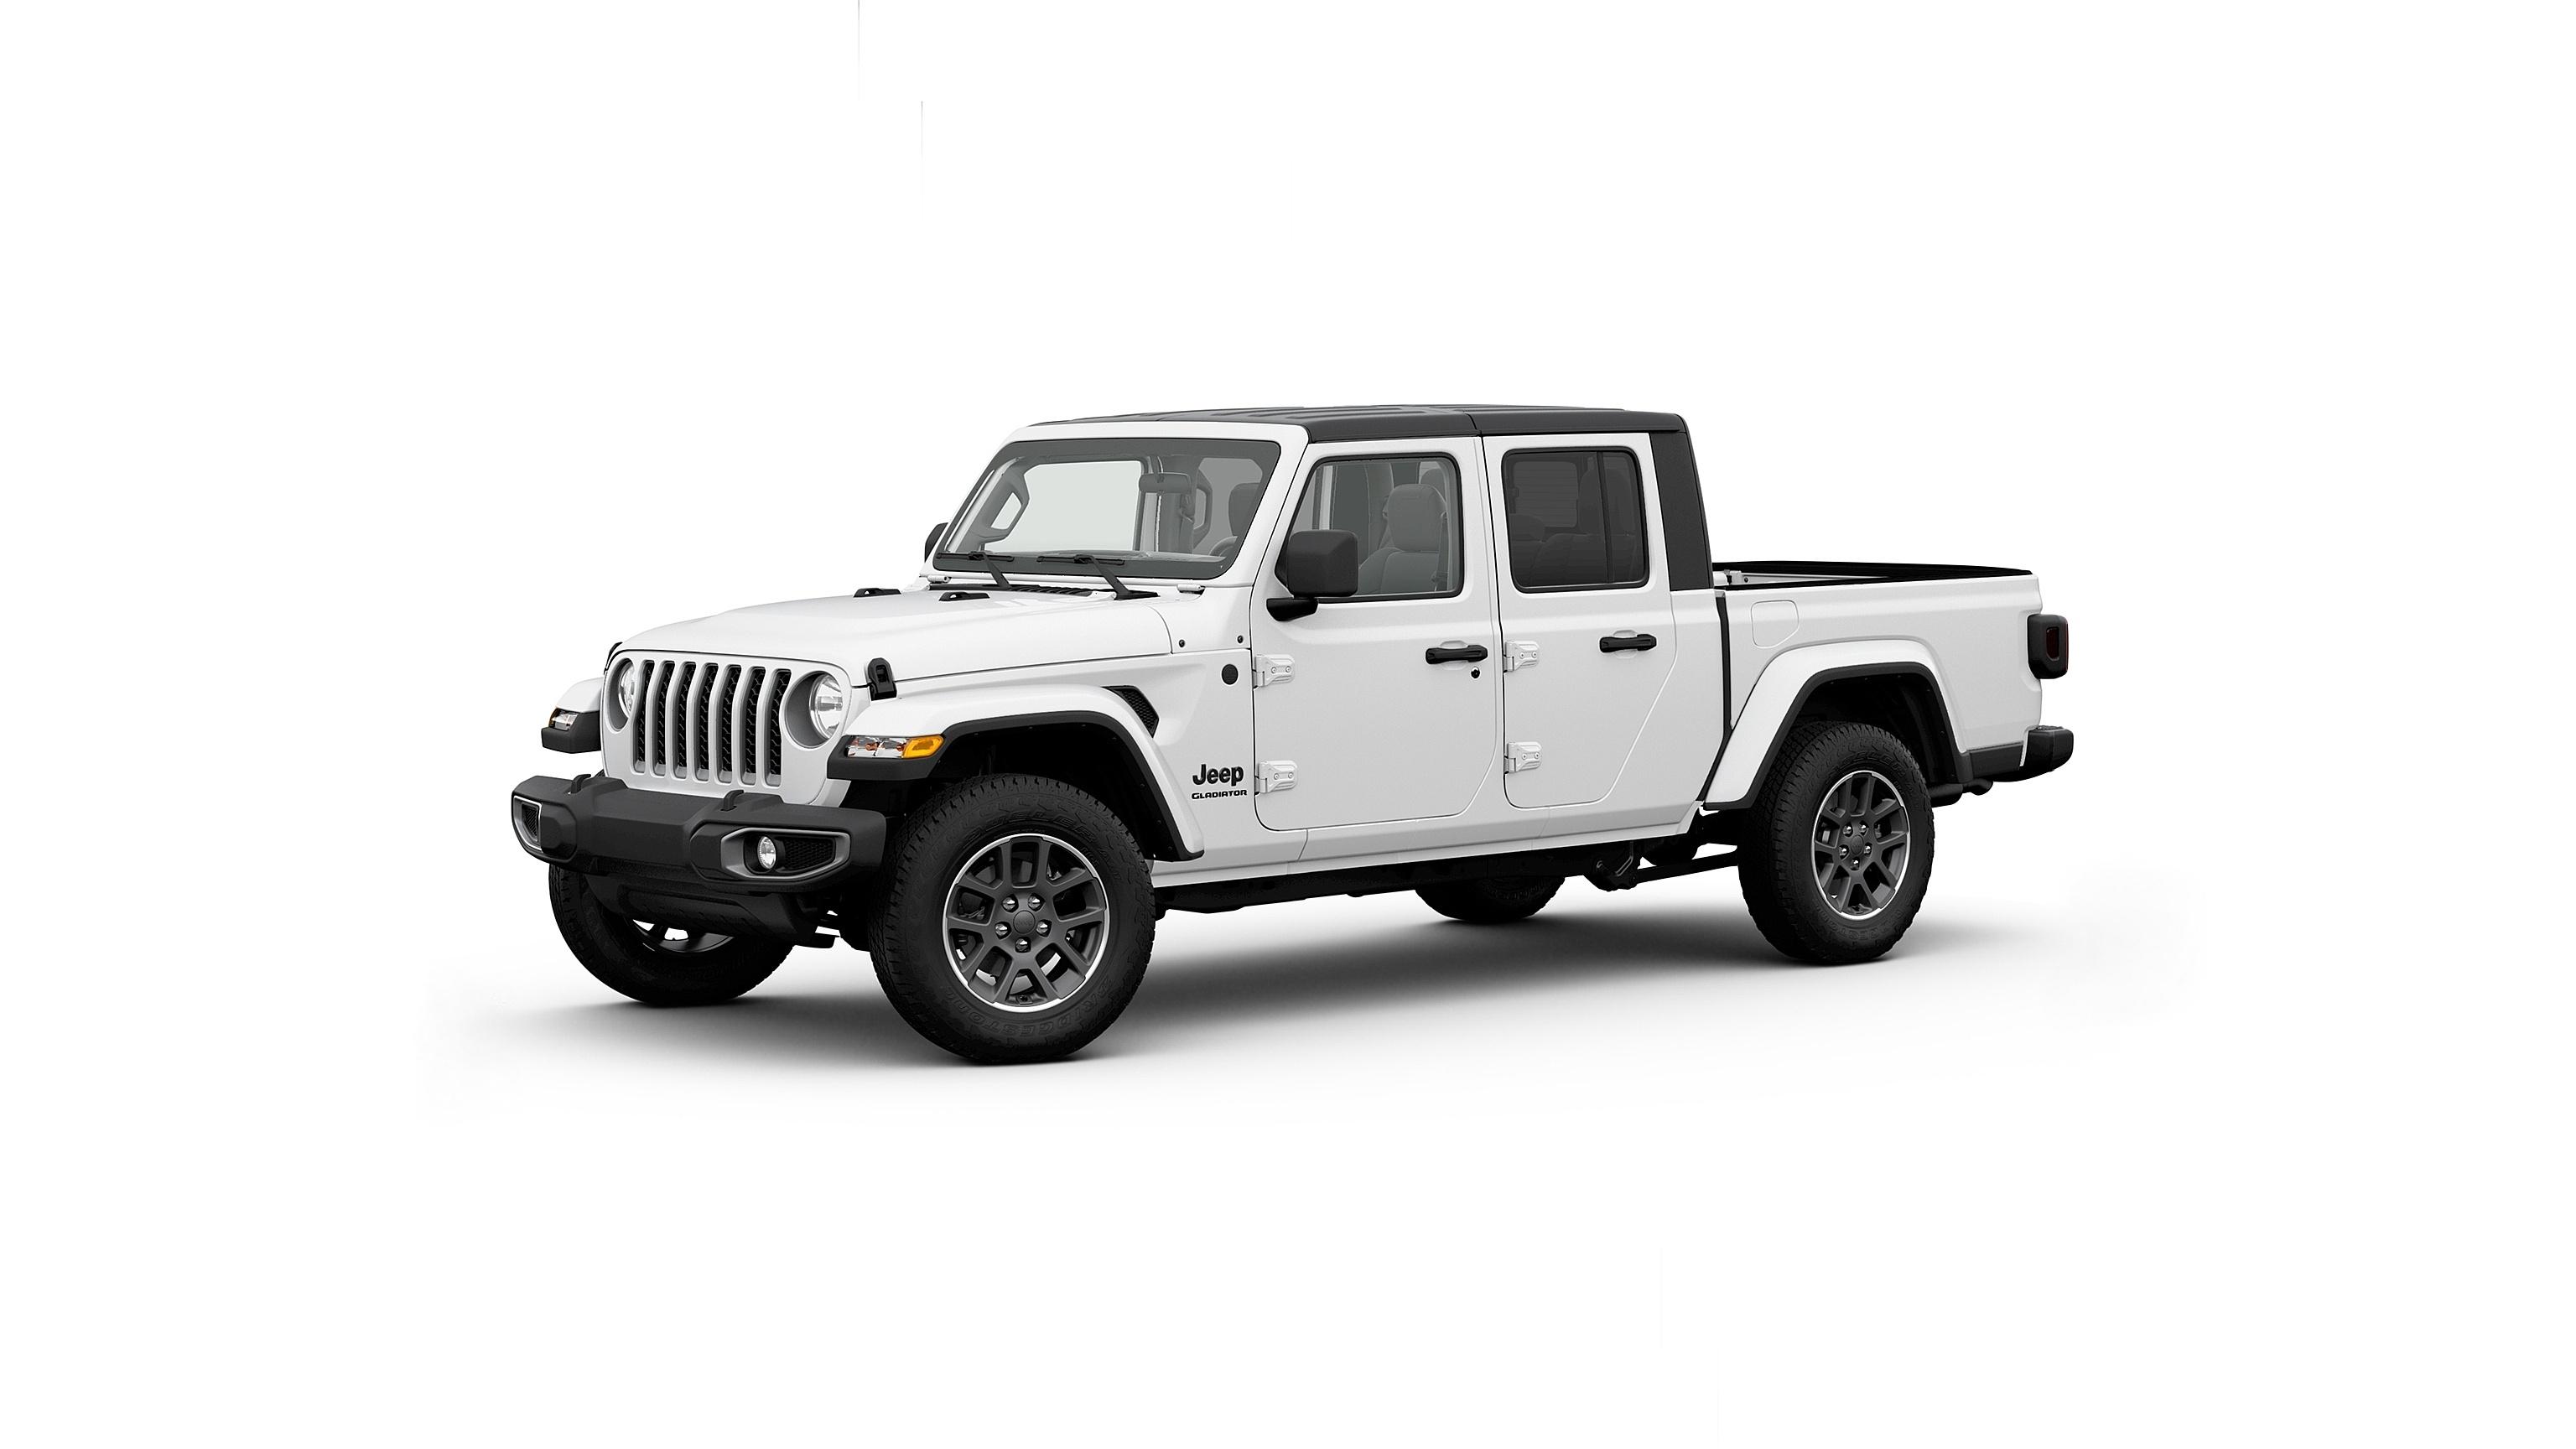 Image Jeep Gladiator, 2020 Pickup White Side automobile White background auto Cars